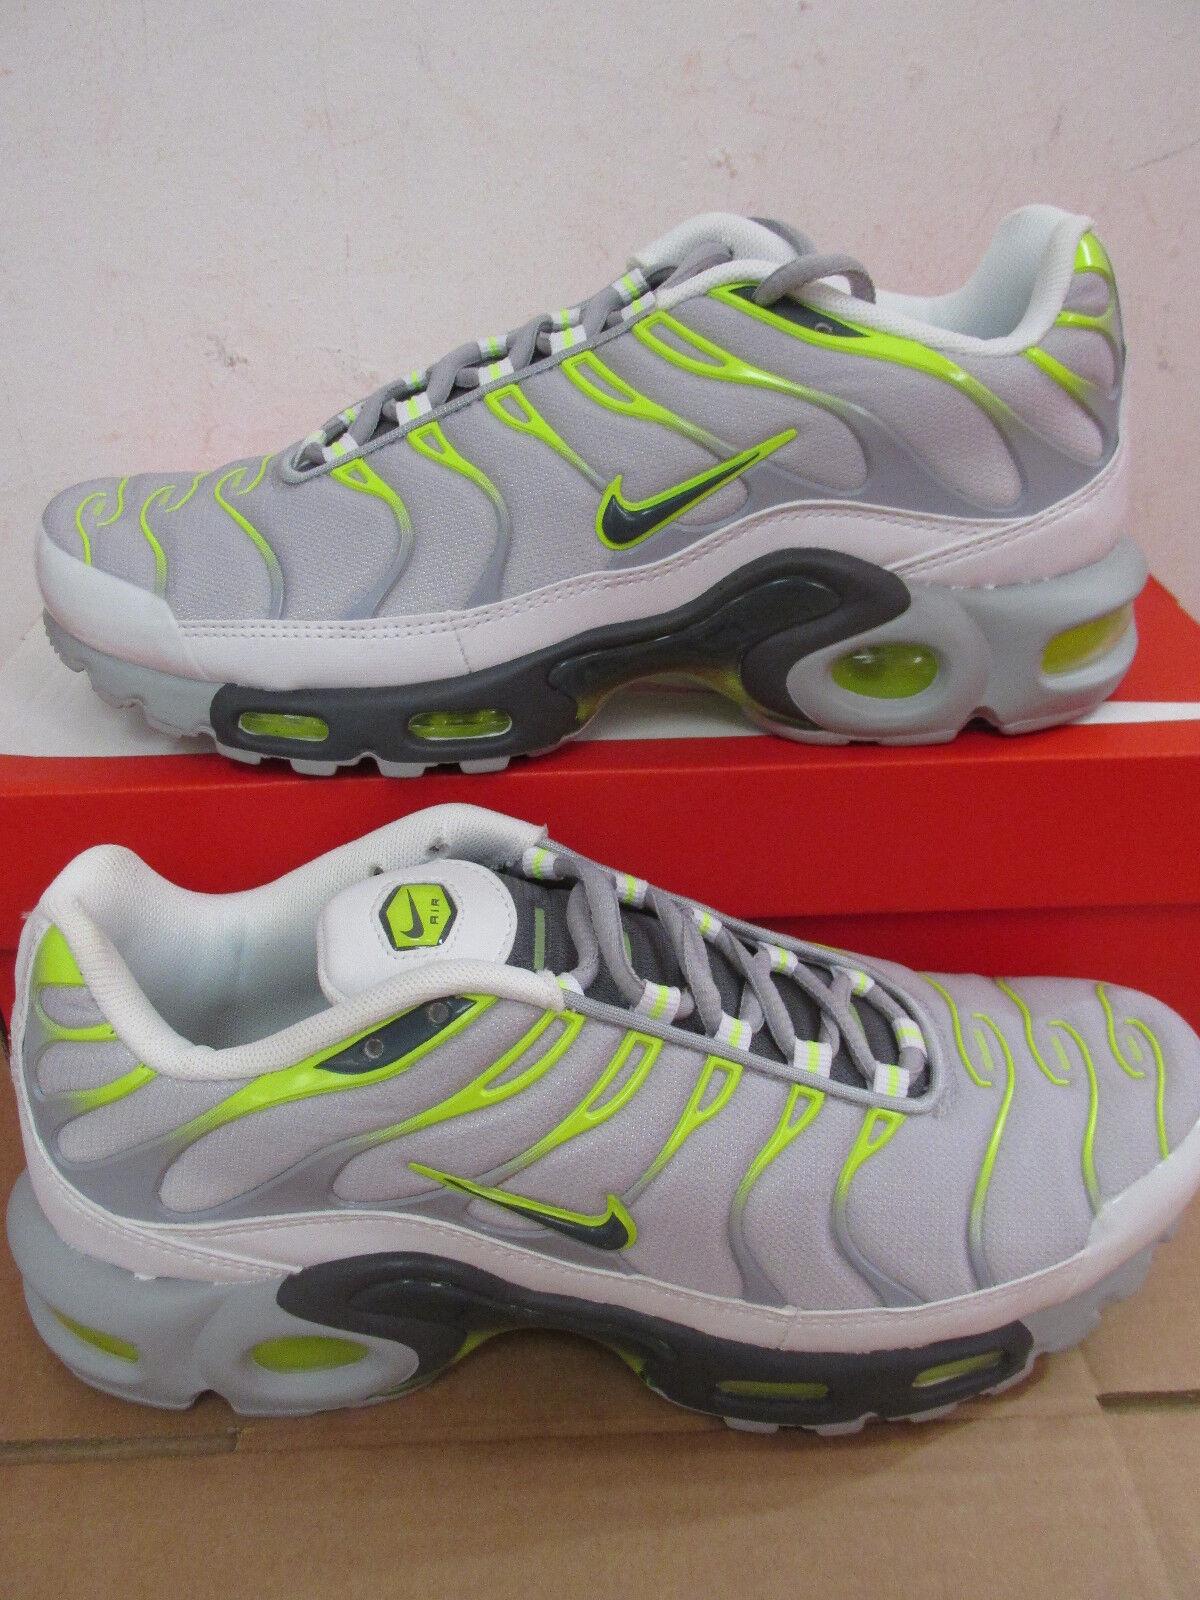 a19d9db54f248 Nike Air Running Max Plus Homme Running Air Baskets 852630 003 Baskets  Chaussures De Dégagement 837928